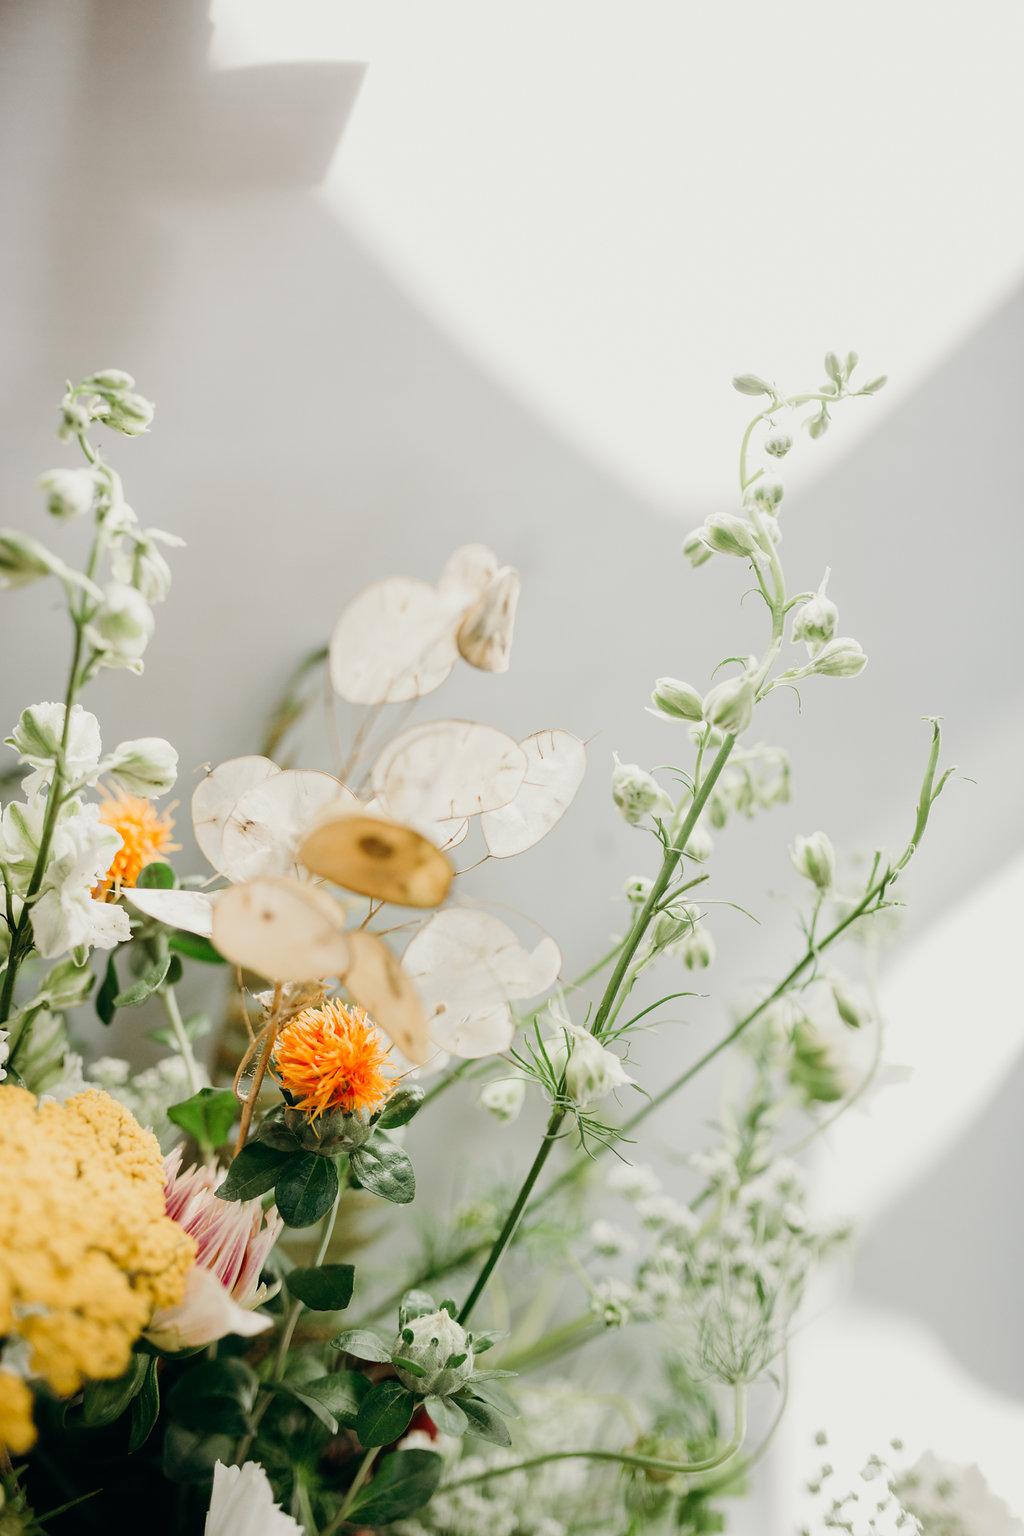 stephanie-green-wedding-photography-sulaflowers london florist wedding florist wild wedding style